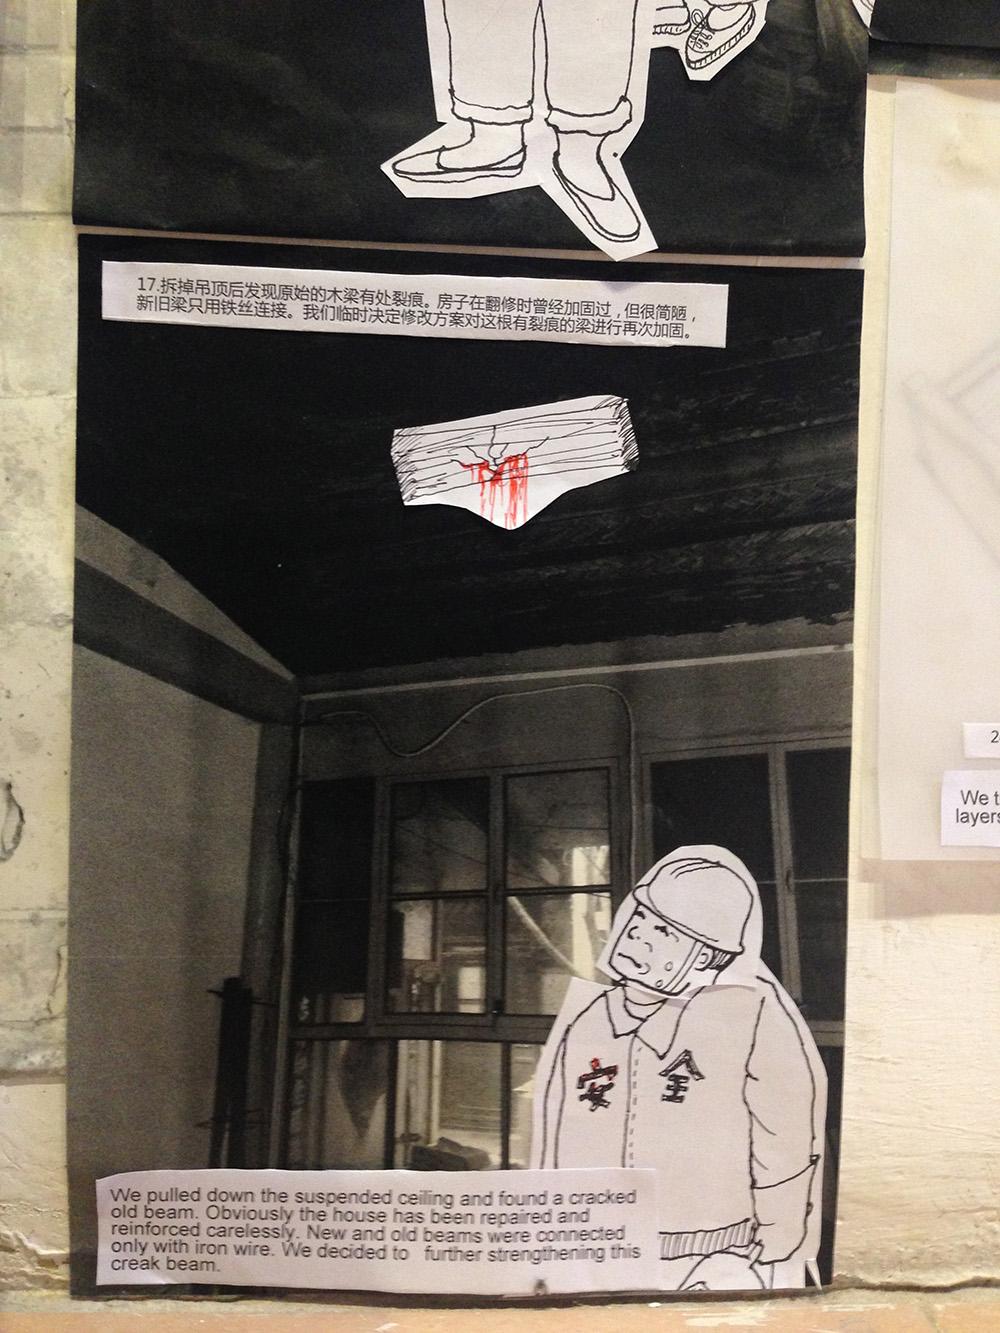 Caopu-humble-hostel-story2015-hisheji (16)